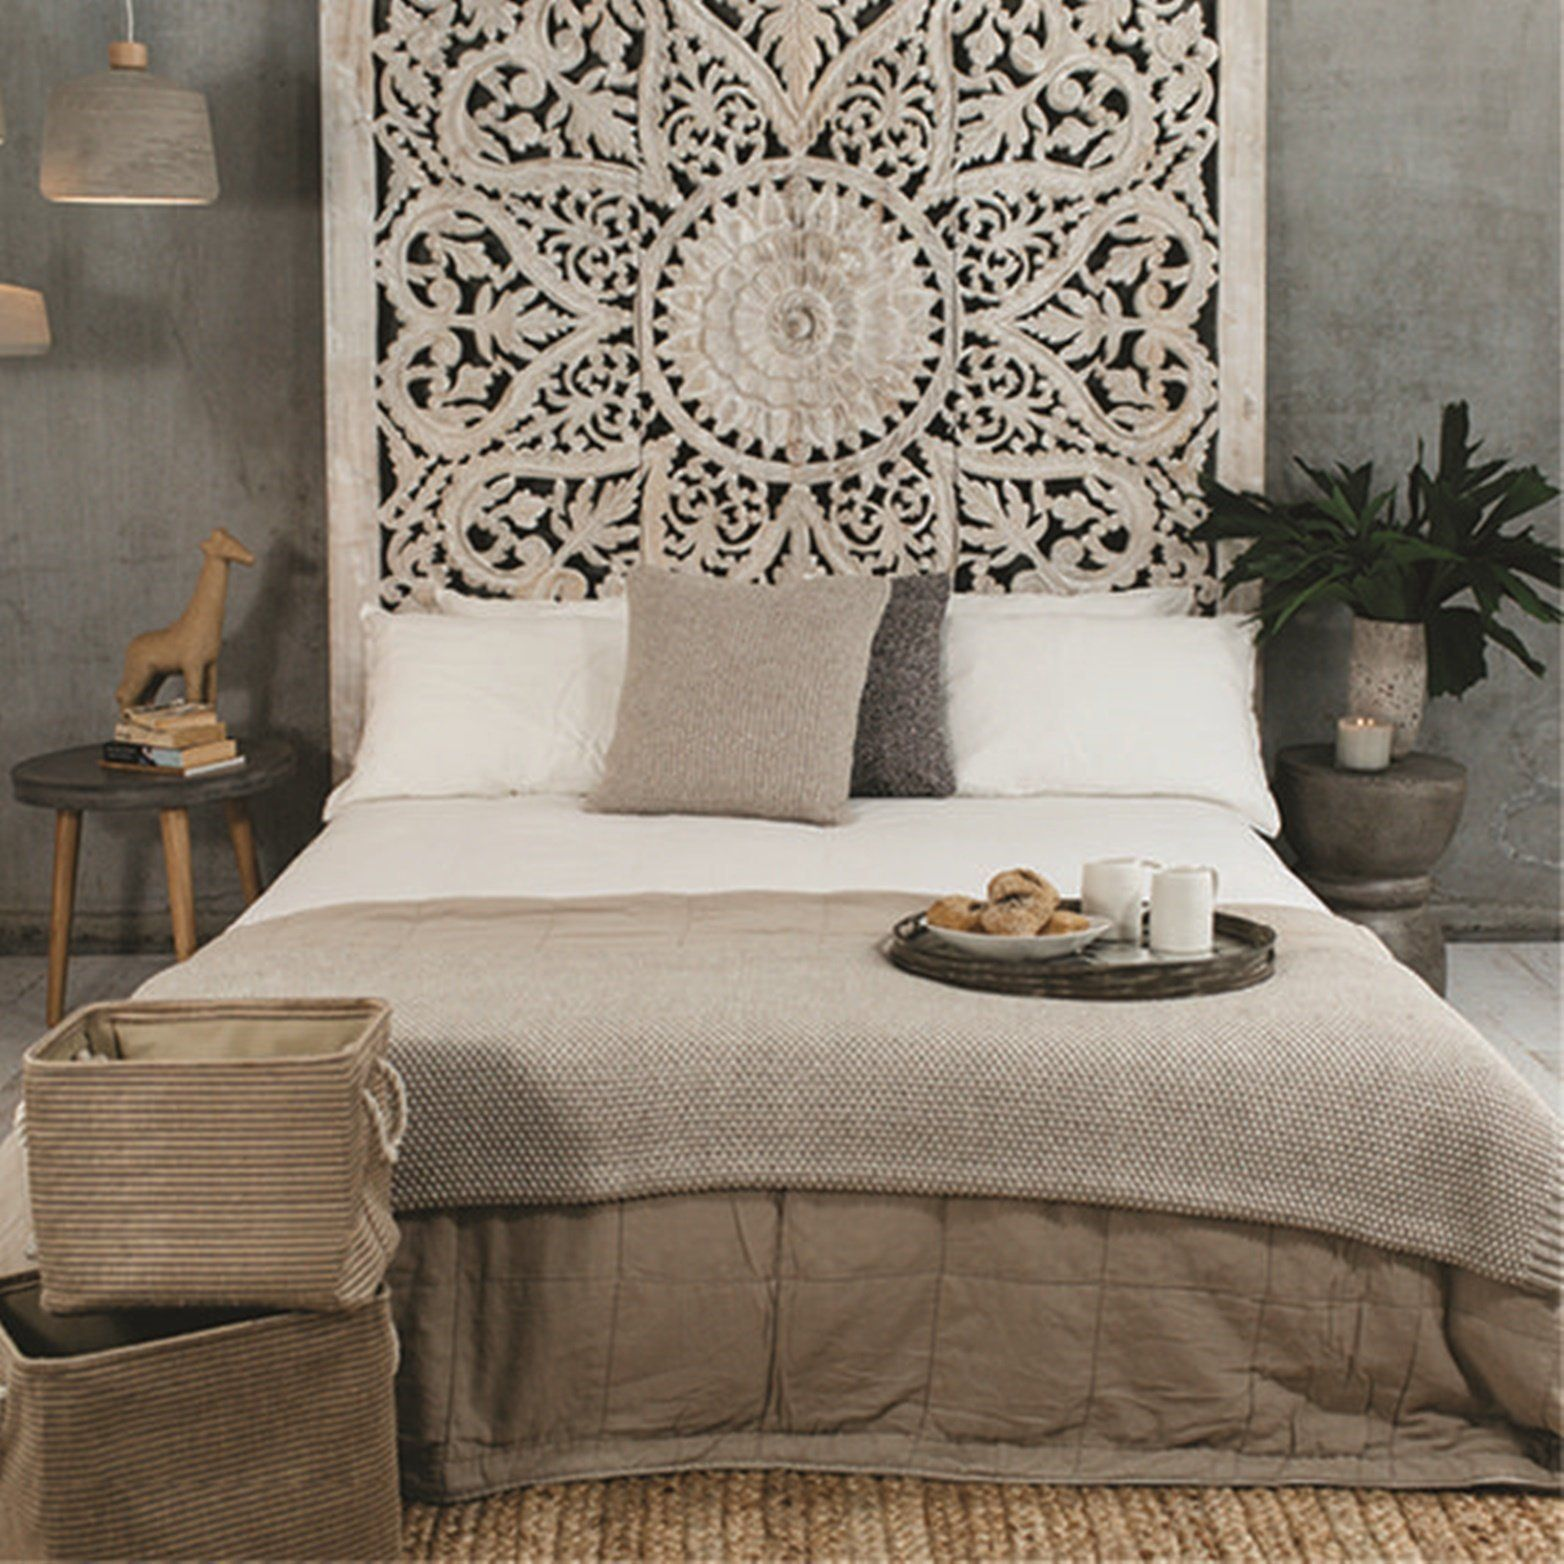 71 Large Wall Art King Size Bed Sculpture Bohemian Headboard